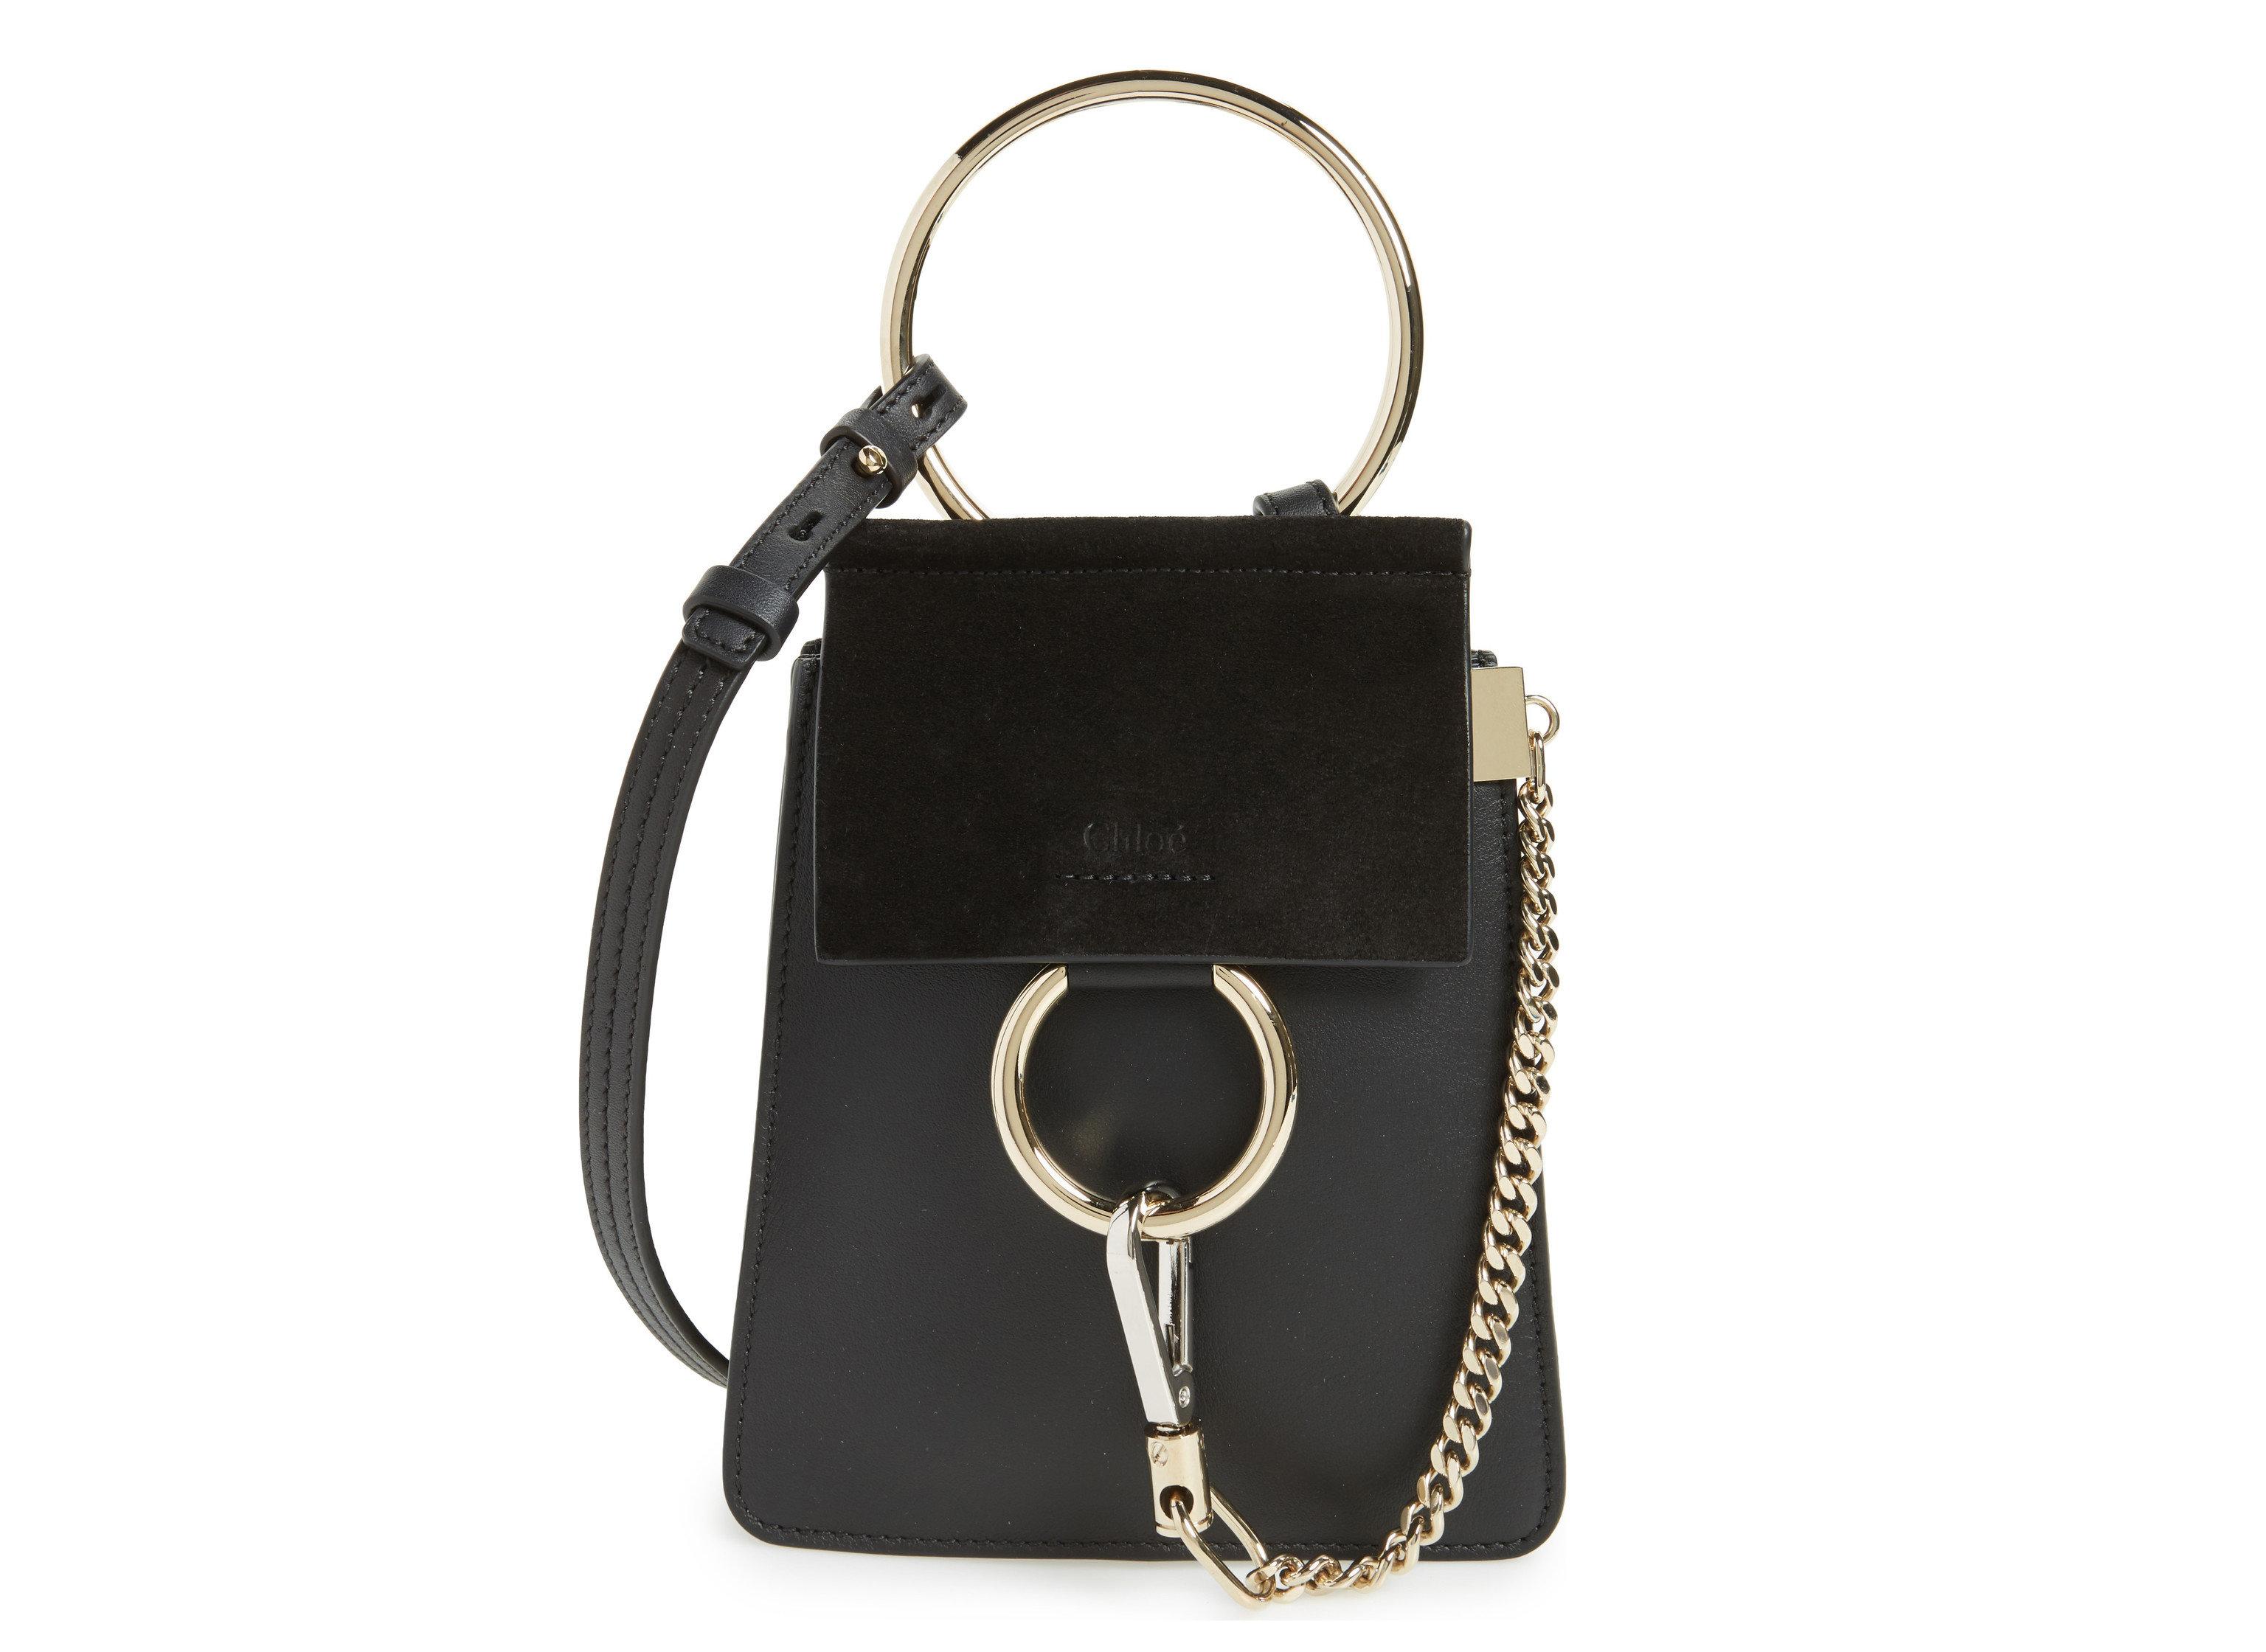 Style + Design Travel Shop bag handbag fashion accessory product shoulder bag leather product design brand luggage & bags